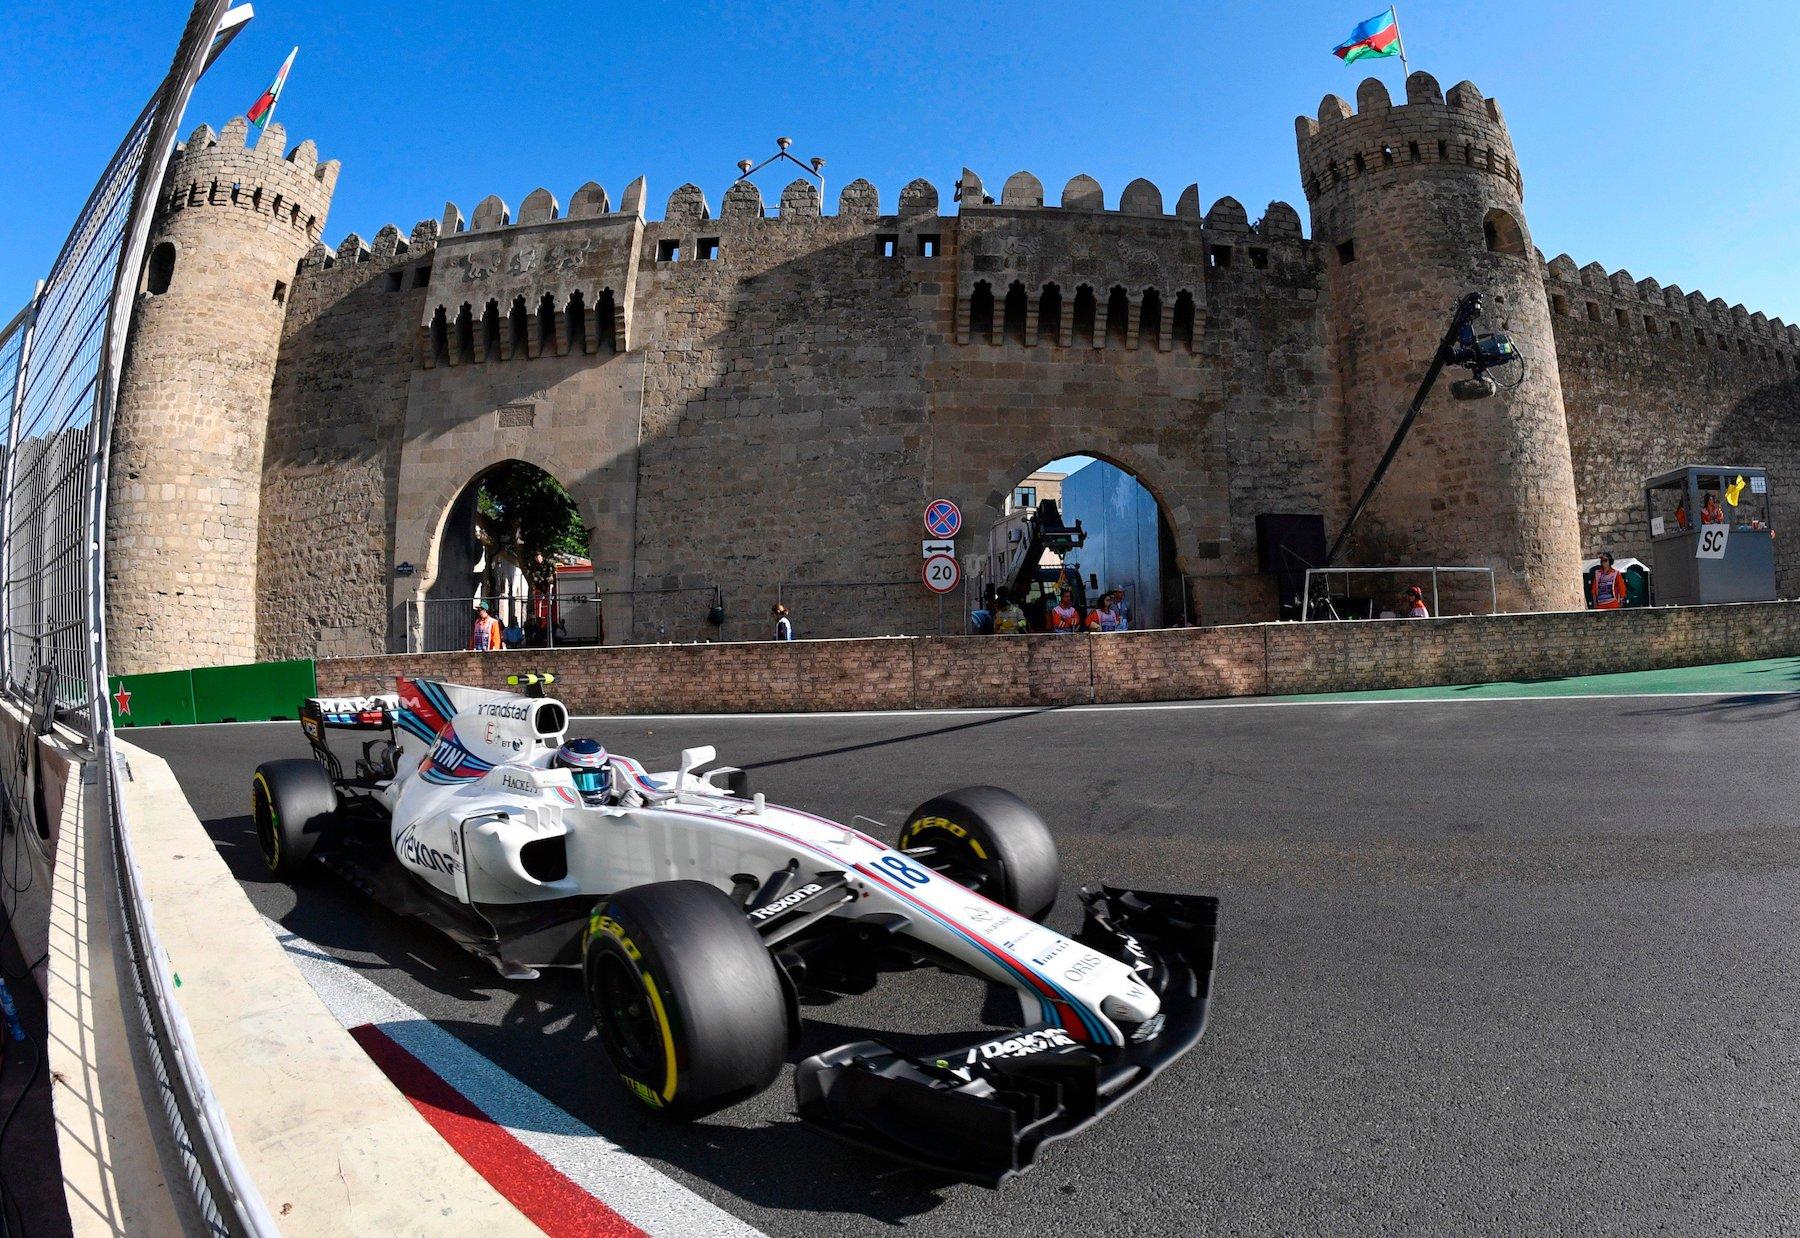 H 2017 Lance Stroll | Williams FW40 | 2017 Azerbaijan GP P3 1 copy.jpg